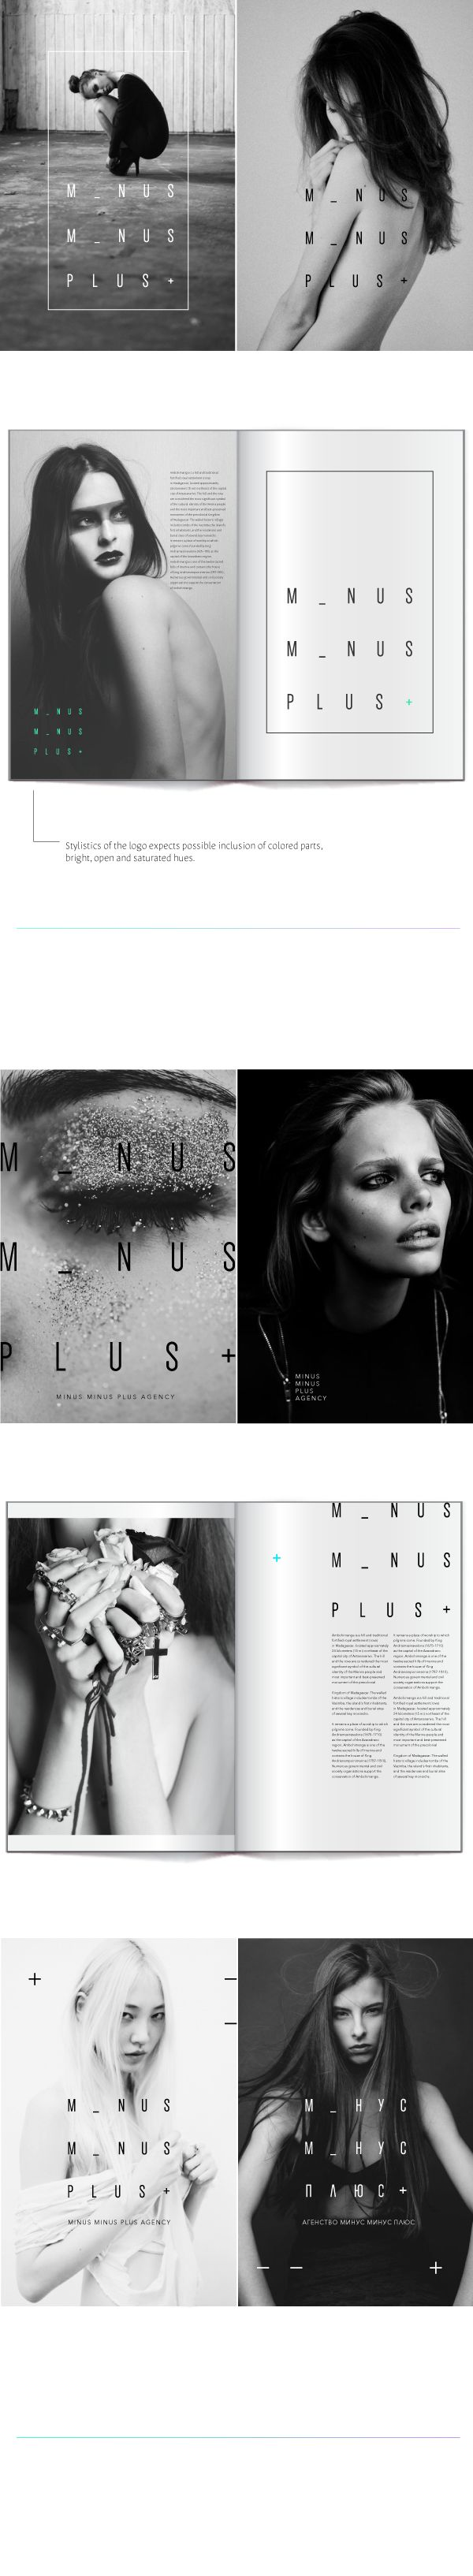 Minus Minus Plus. Photo & video Agency